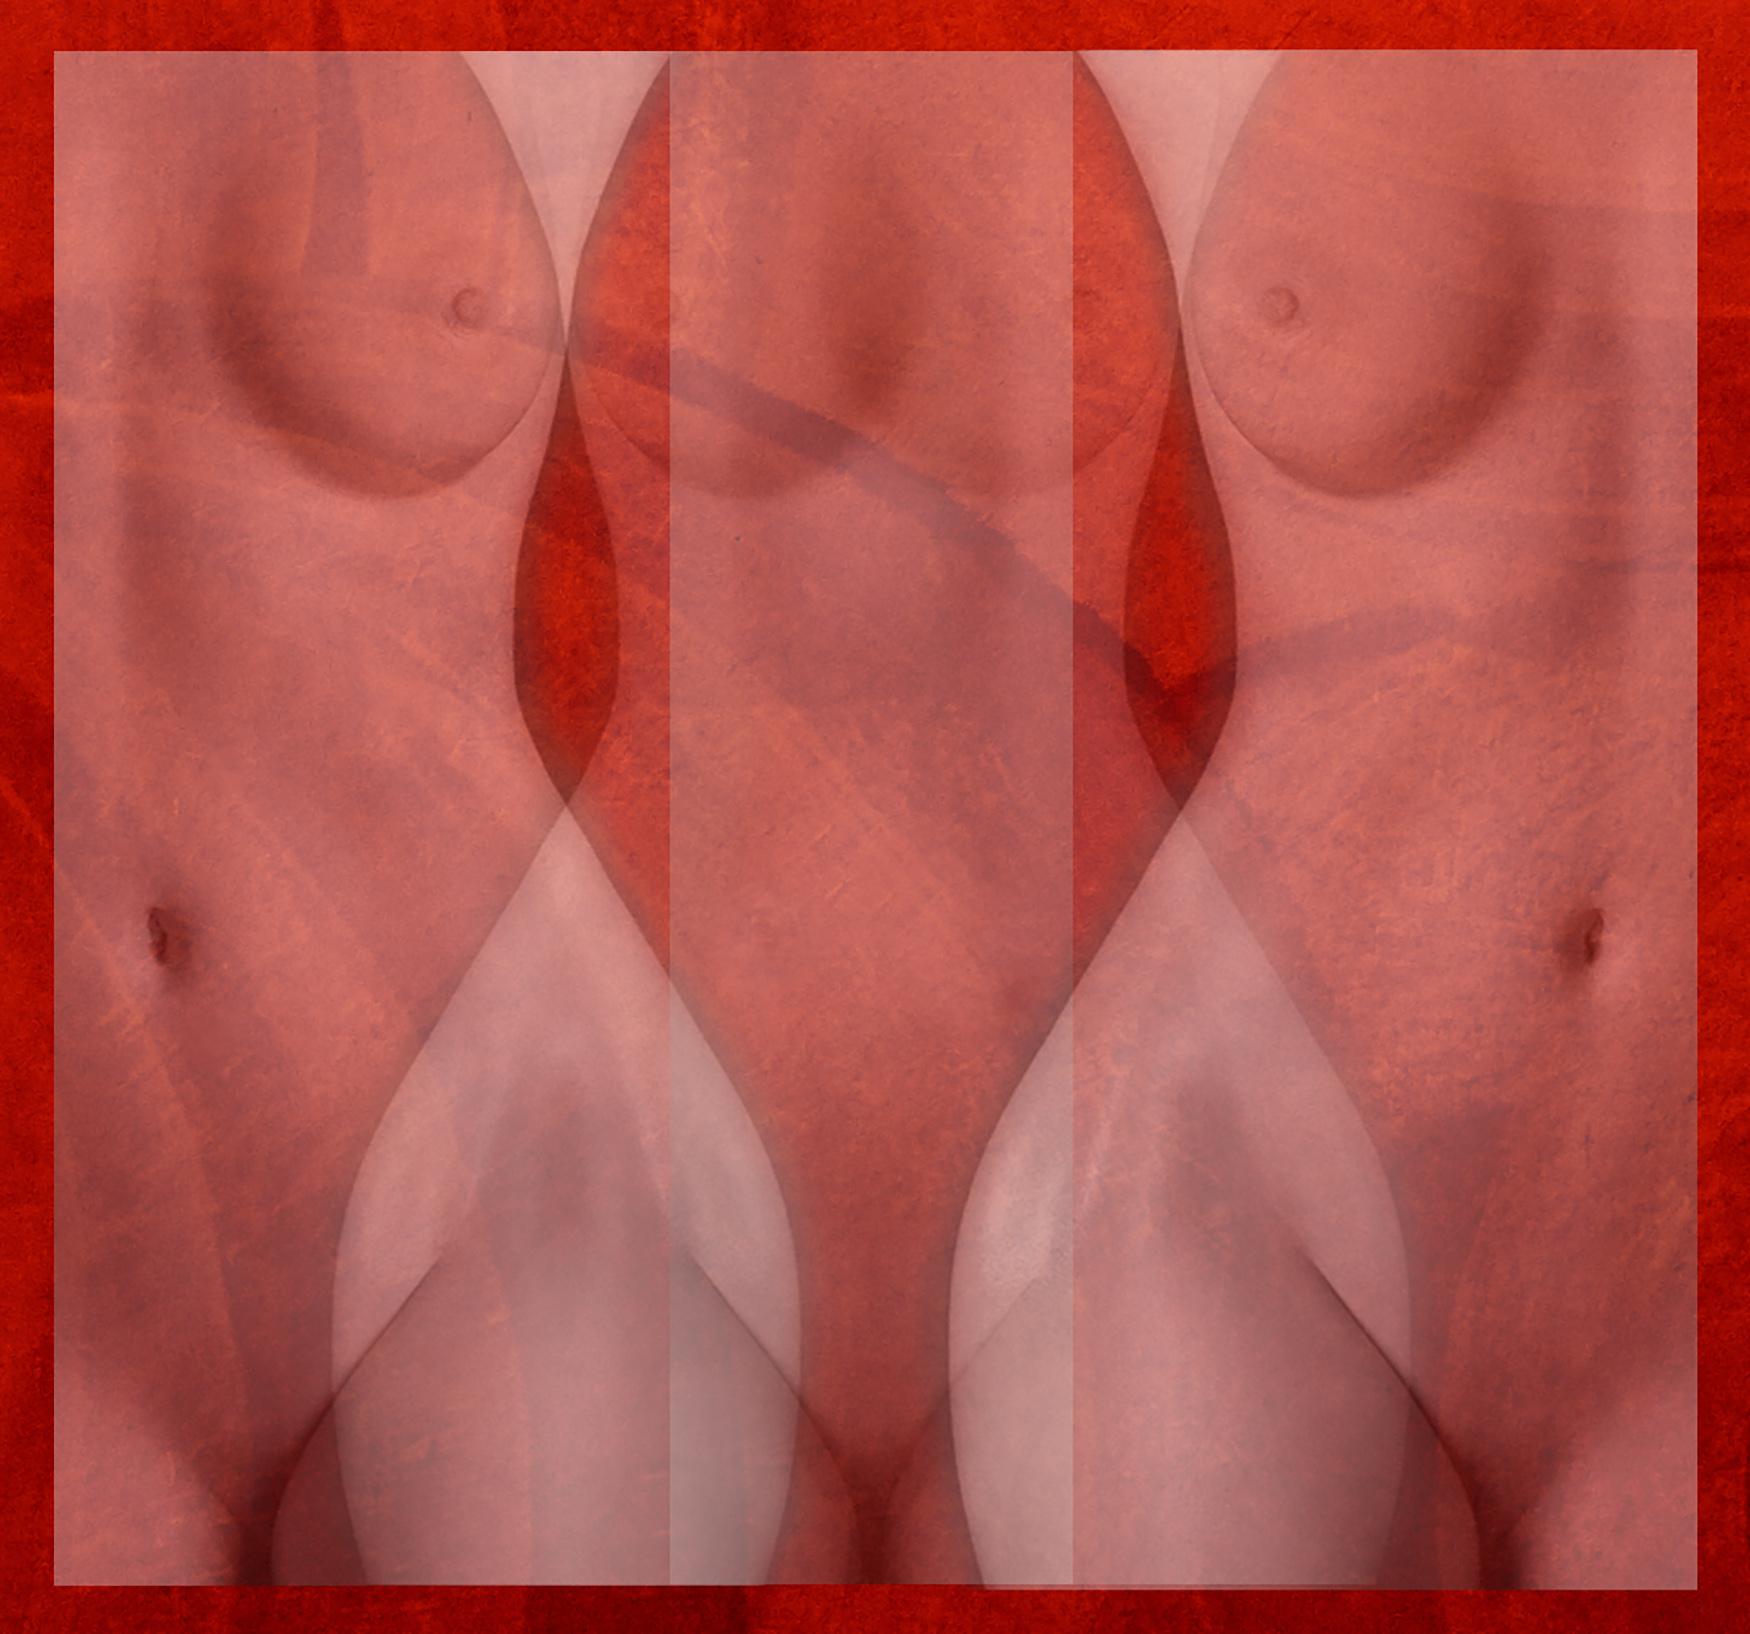 JWA_Human Form_Vicrop.jpg